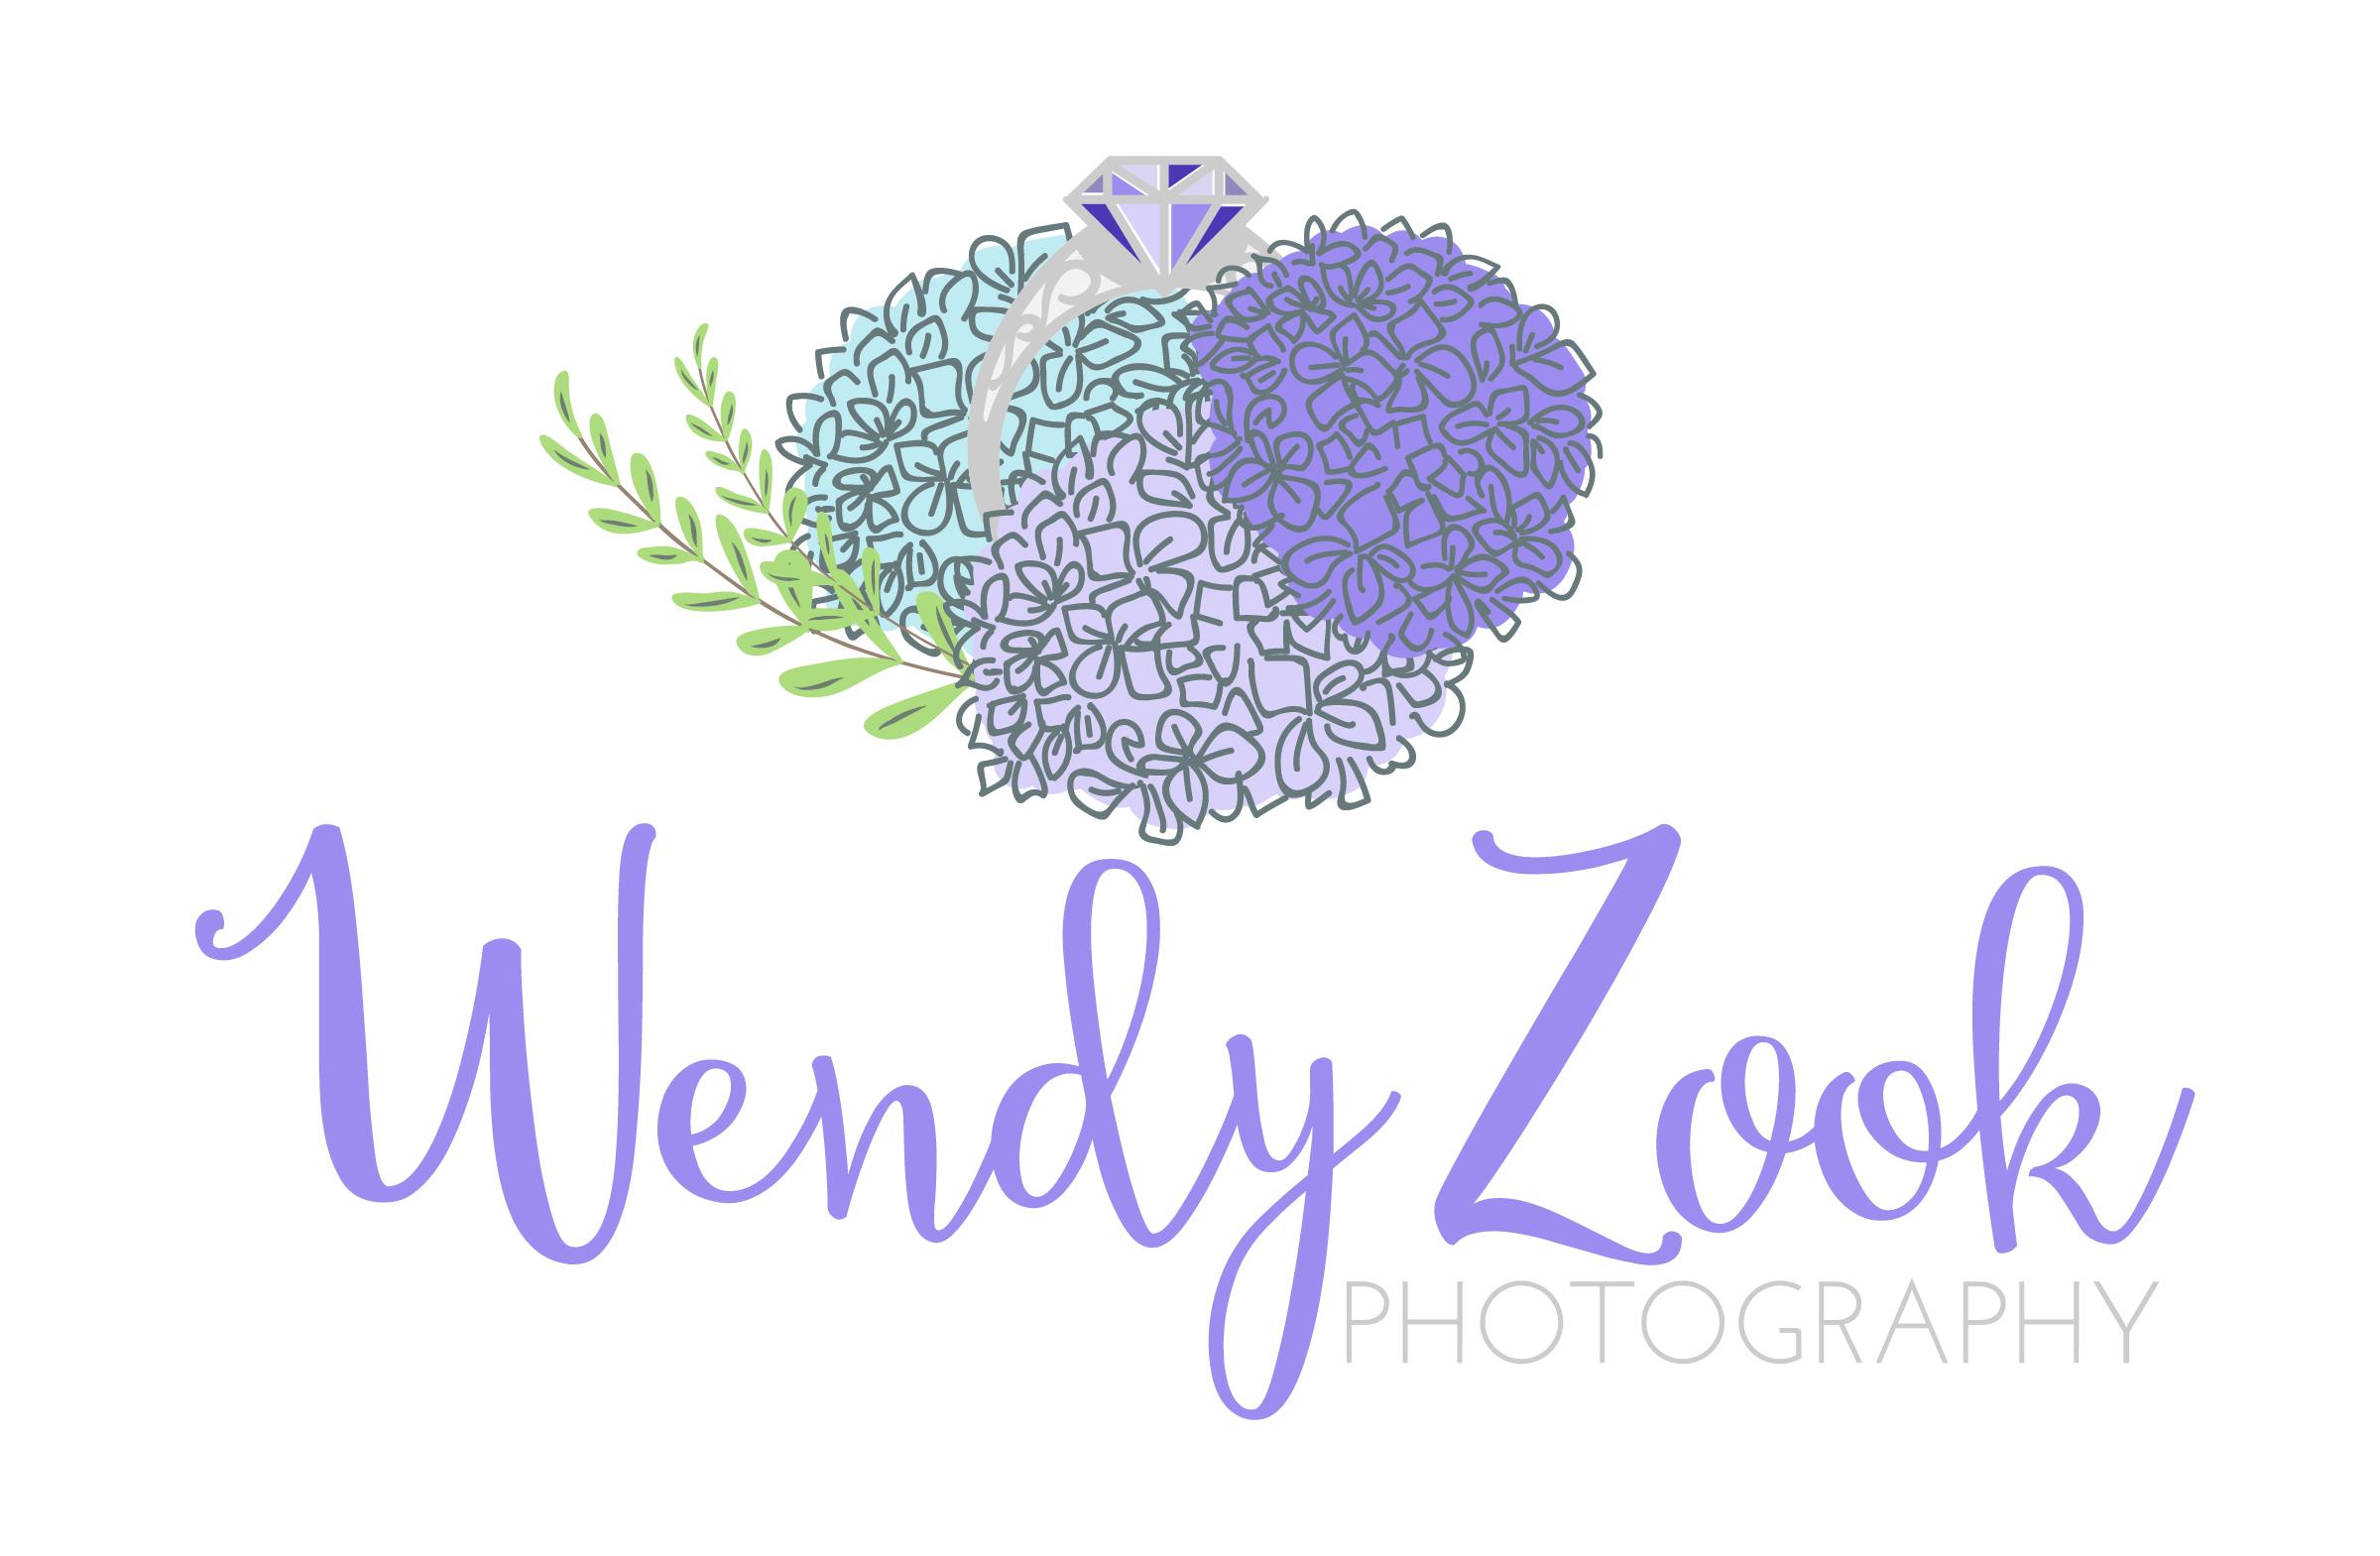 Wendy Zook Photography Logo